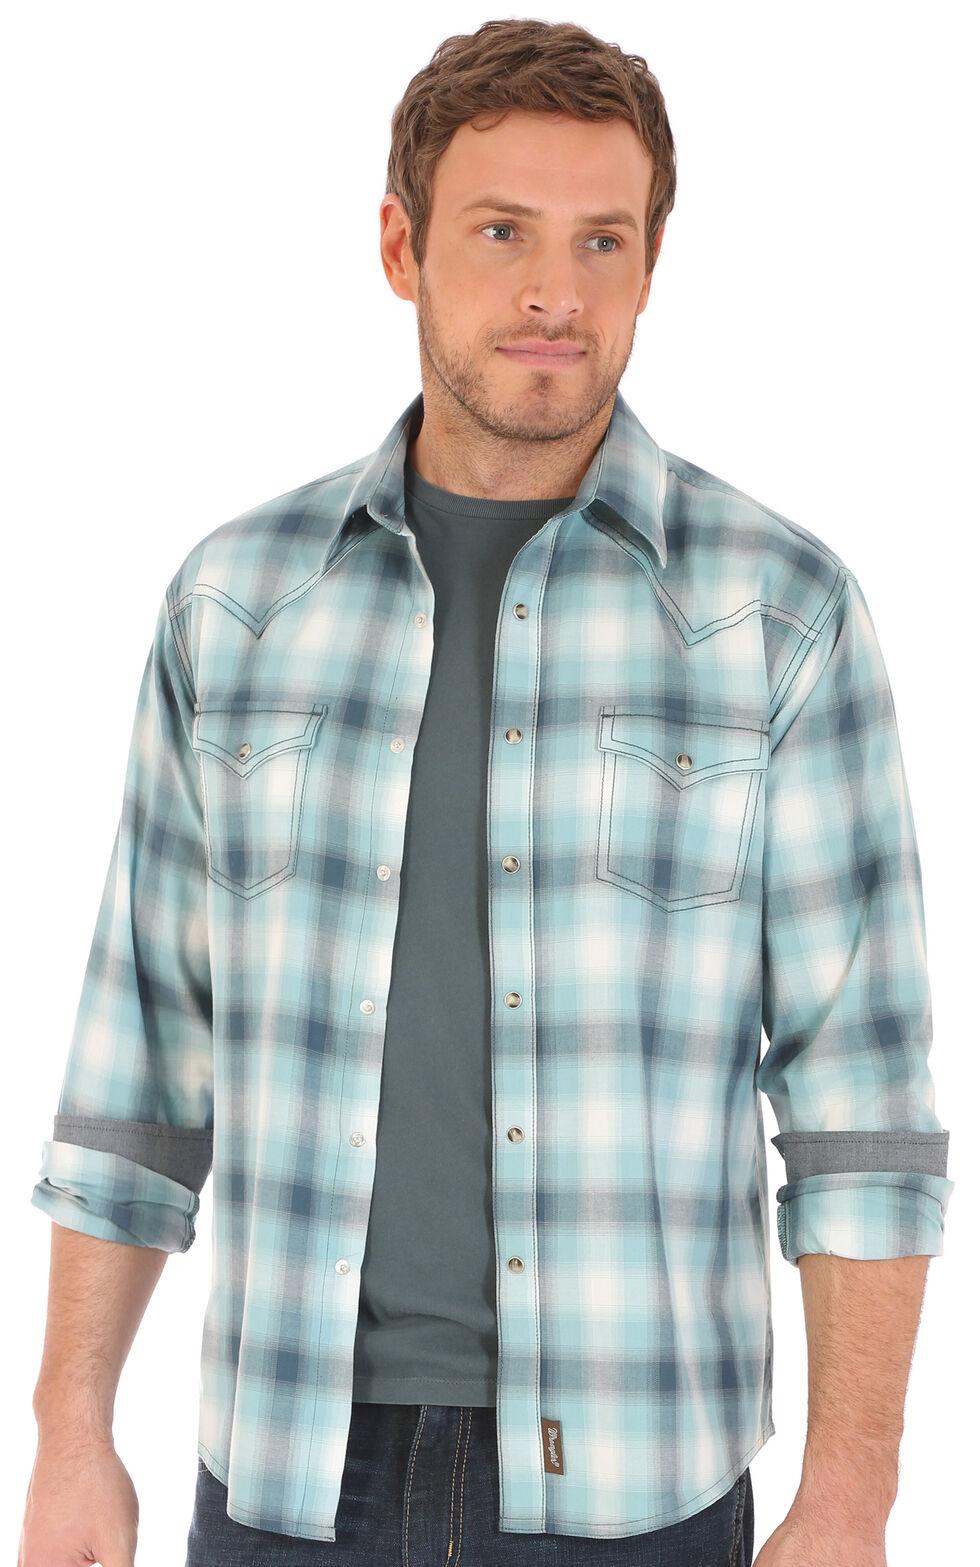 Wrangler Retro Men's Plaid 2 Pocket Long Sleeve Snap Shirt, Teal, hi-res